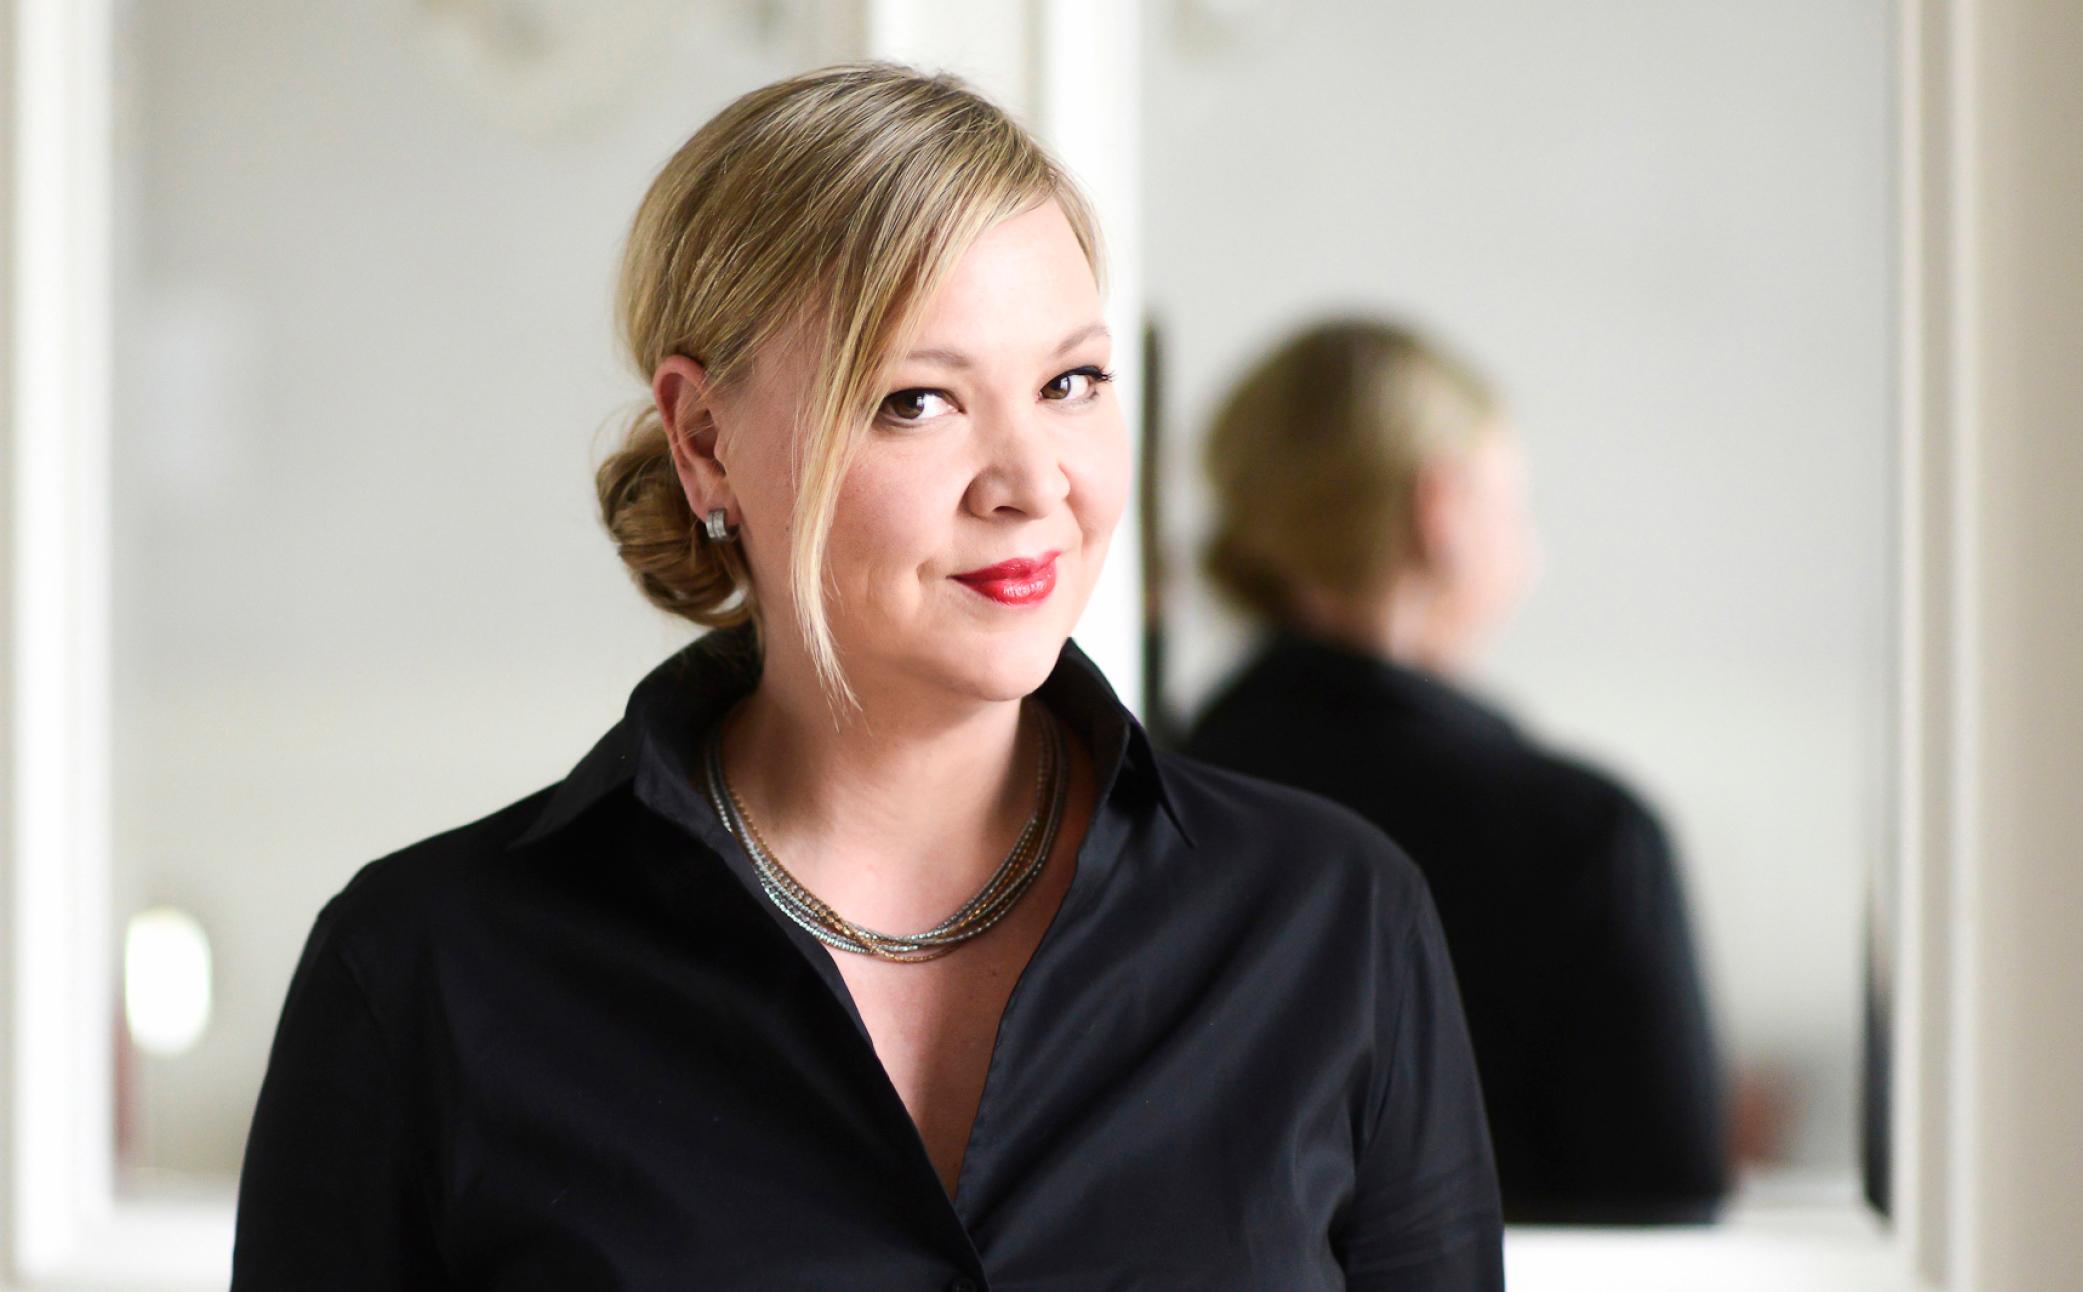 Frau auf einem Business Foto - Business Portraits - Business Branding Fotografie Berlin